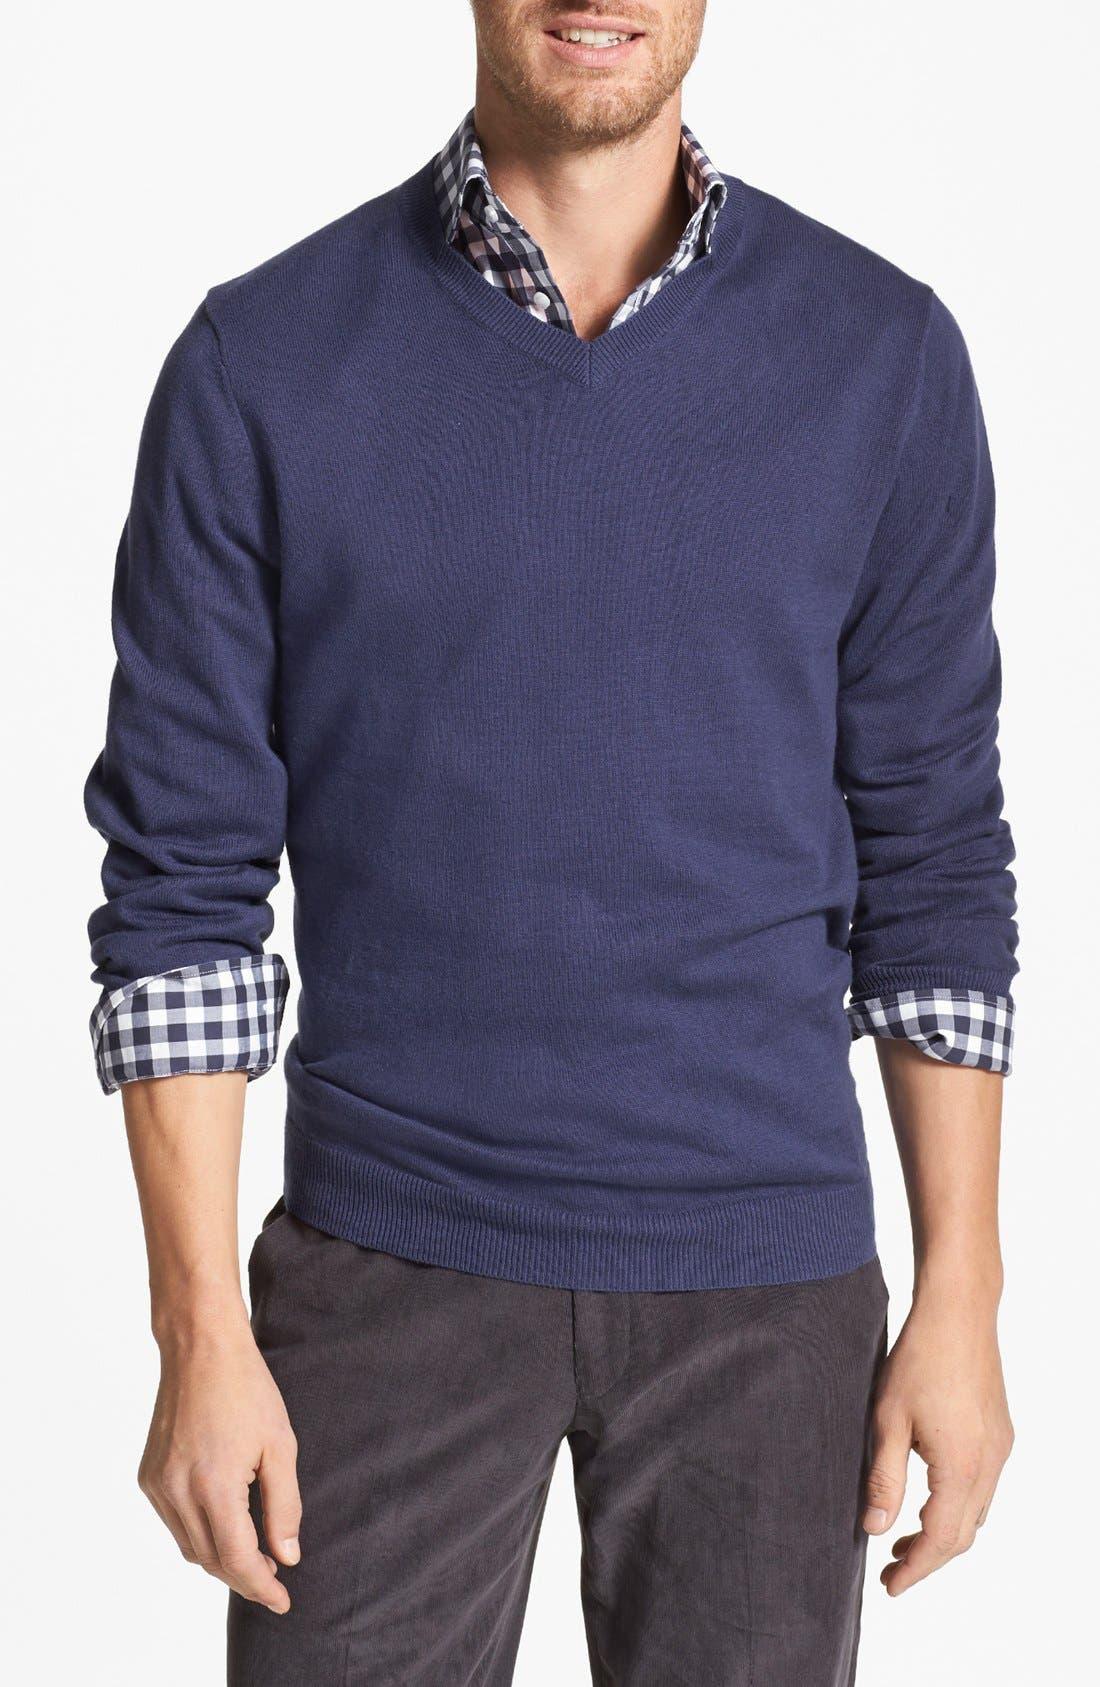 Alternate Image 1 Selected - Wallin & Bros. Trim Fit V-Neck Cotton & Cashmere Sweater